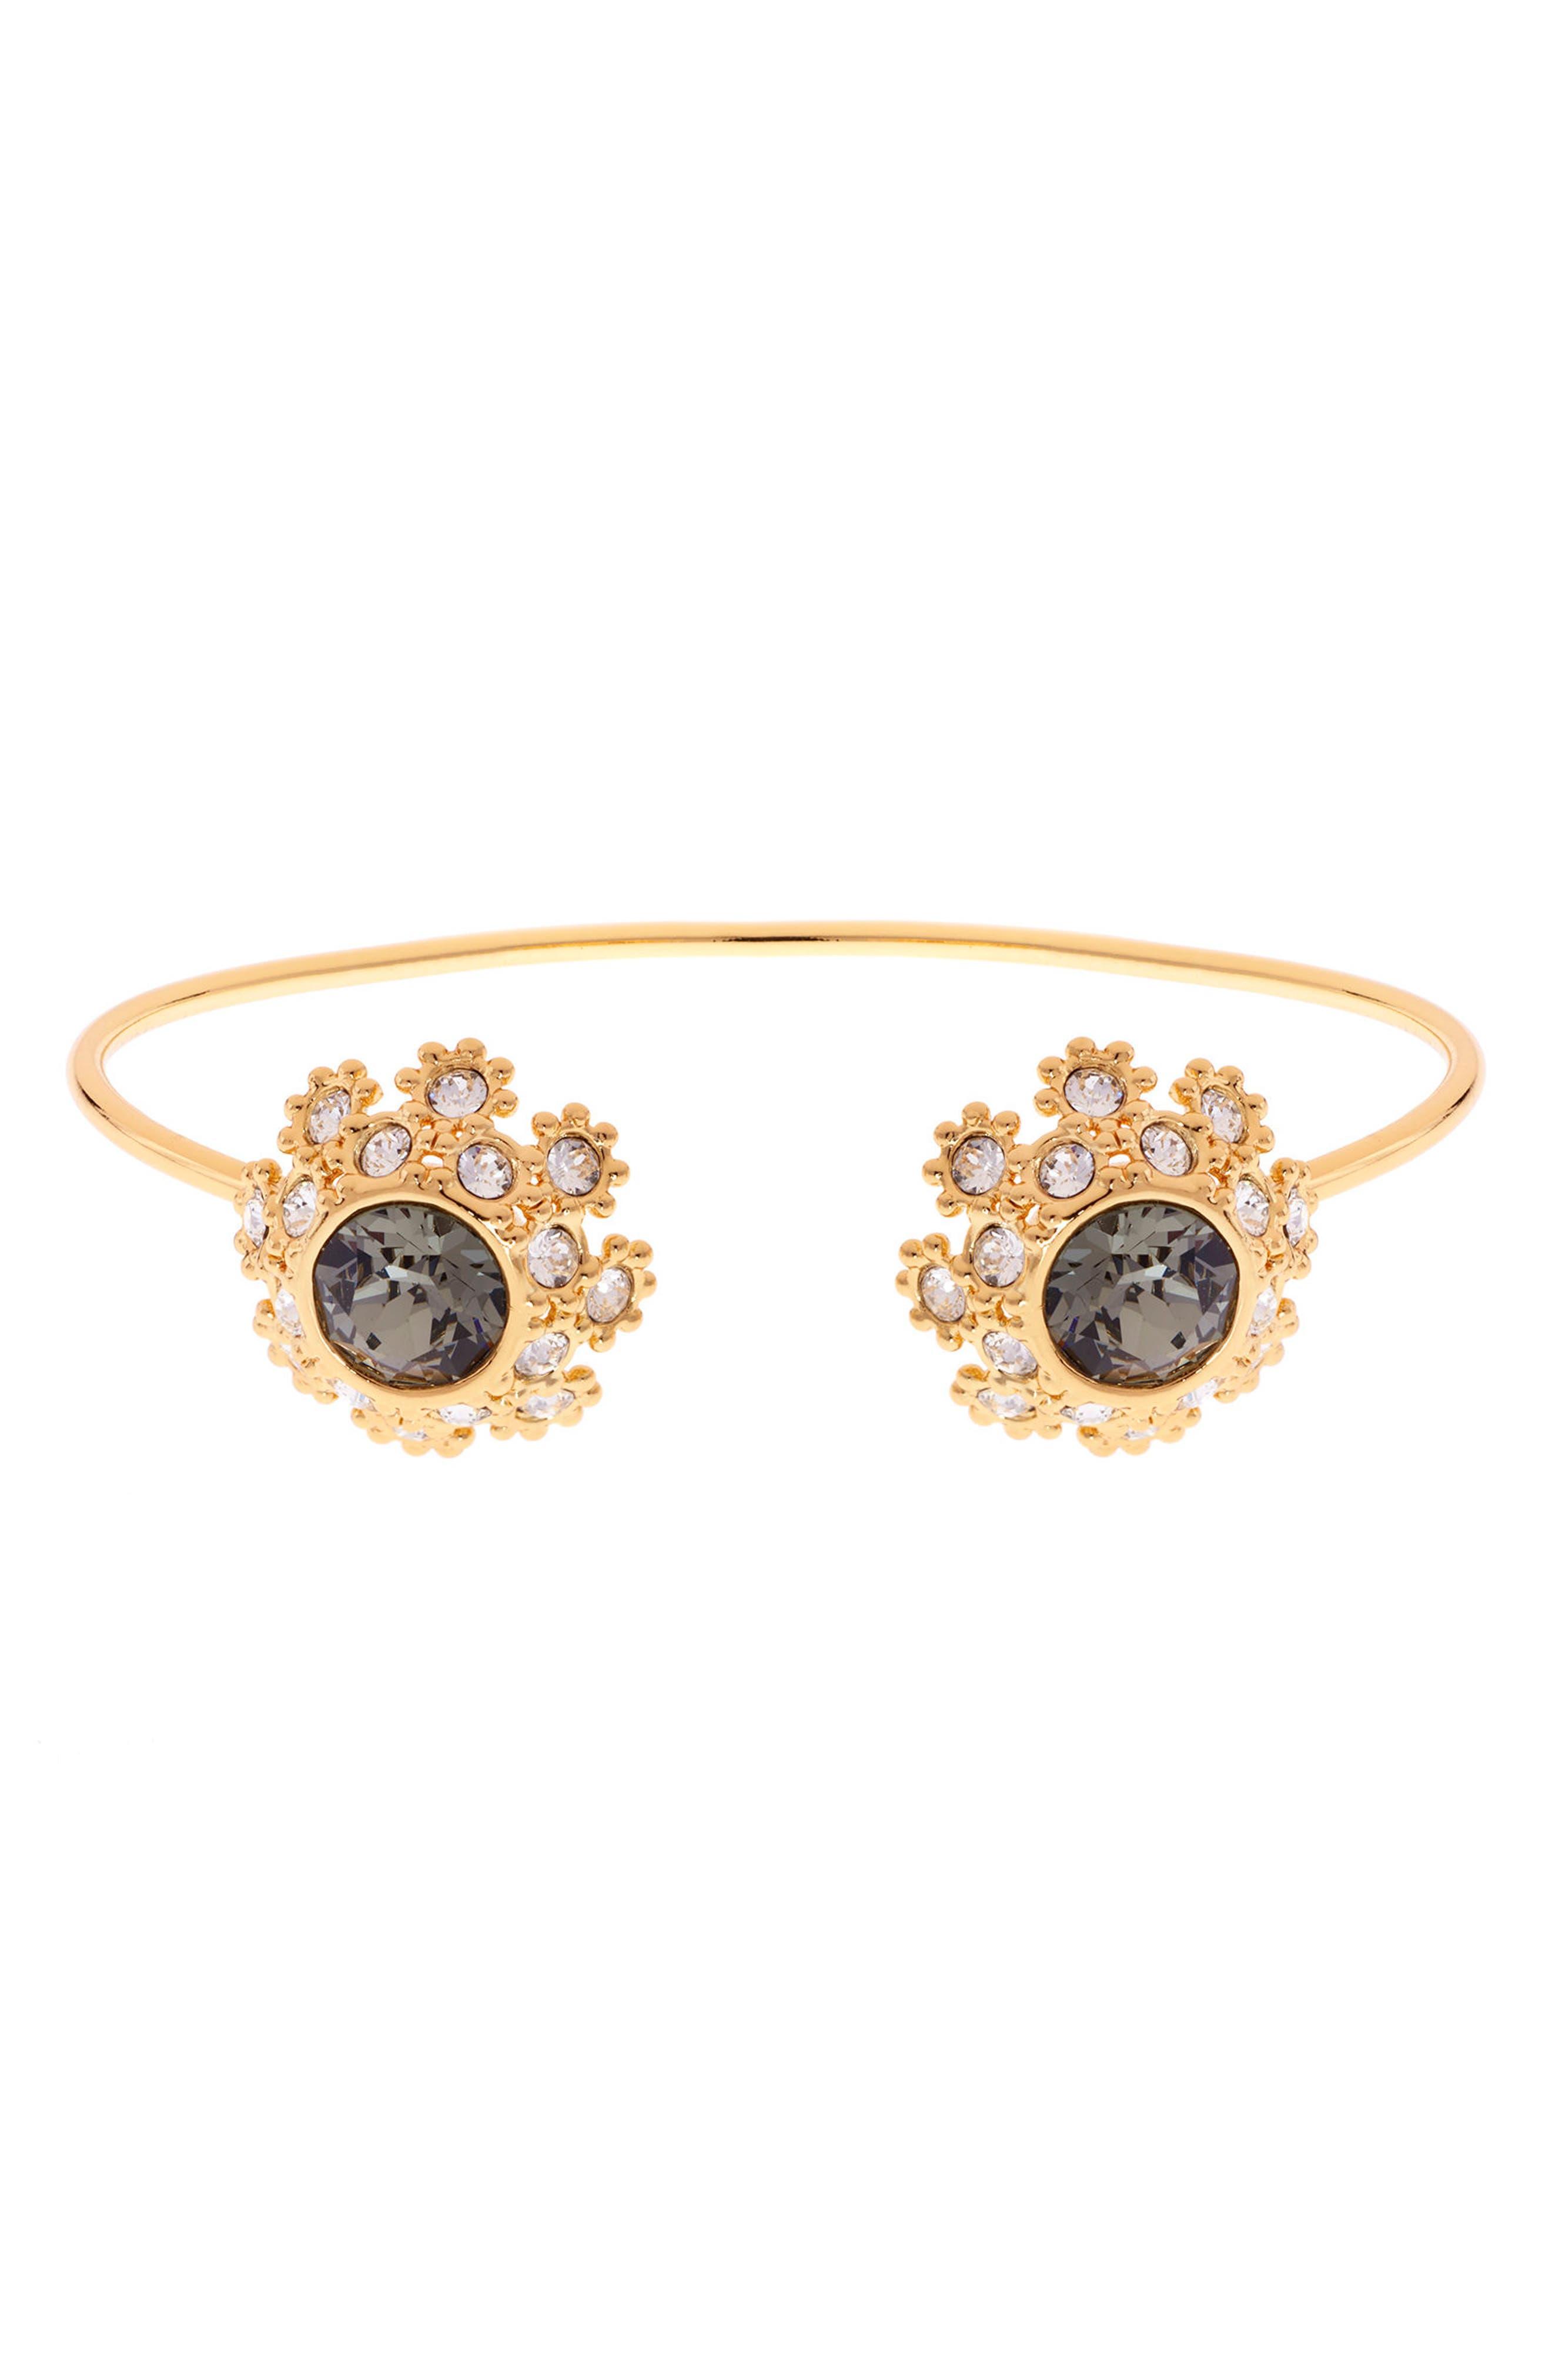 Main Image - Ted Baker London Crystal Daisy Lace Cuff Bracelet